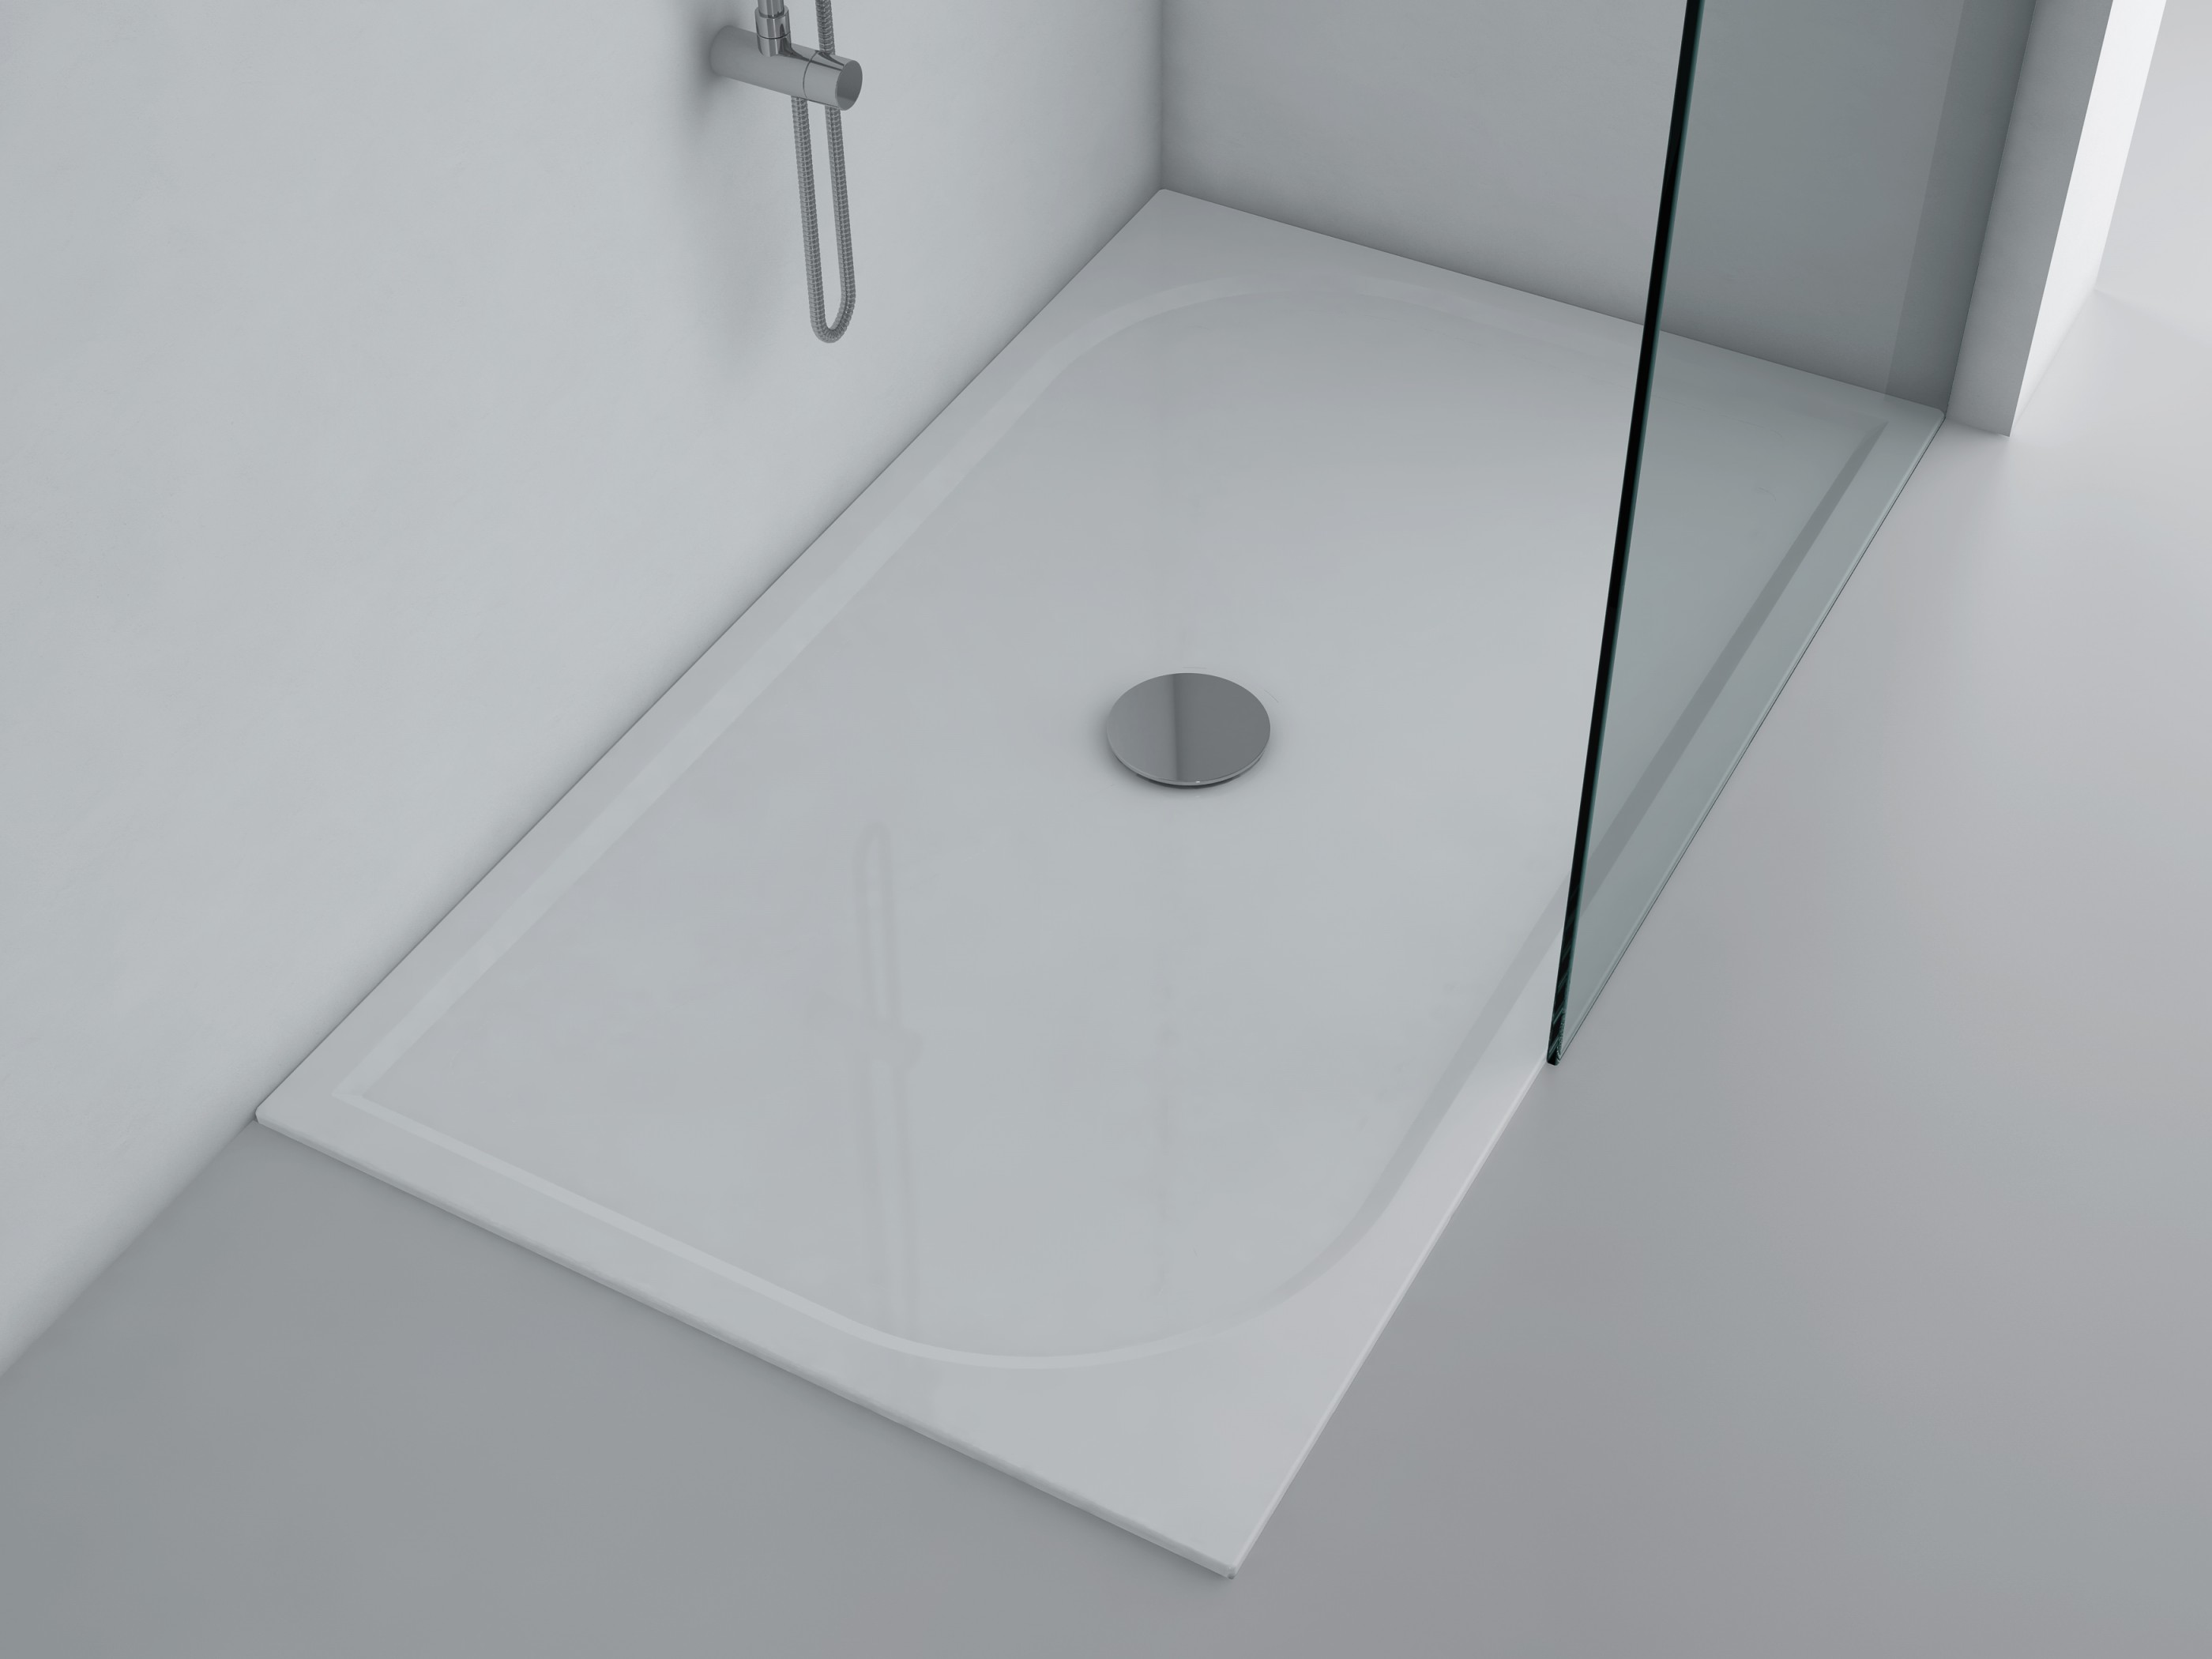 duschwanne 140x80cm andria mineralguss flach bodengleich inkl f e und ablauf 5109. Black Bedroom Furniture Sets. Home Design Ideas